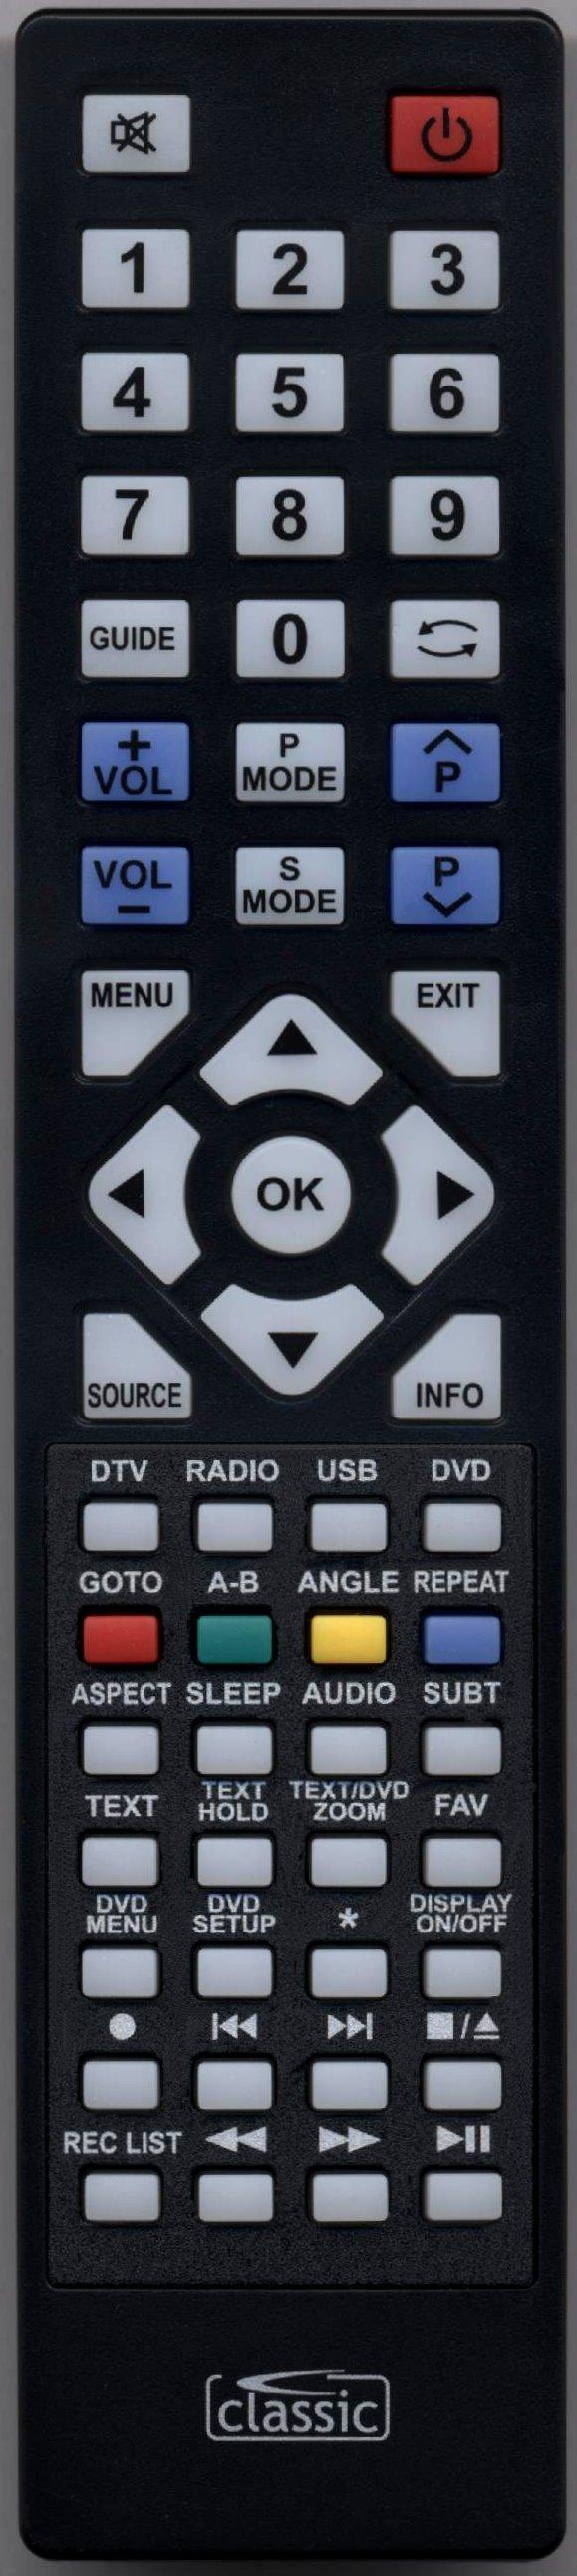 BLAUPUNKT 236/152R-GB-3B-GKU-UK Remote Control Alternative